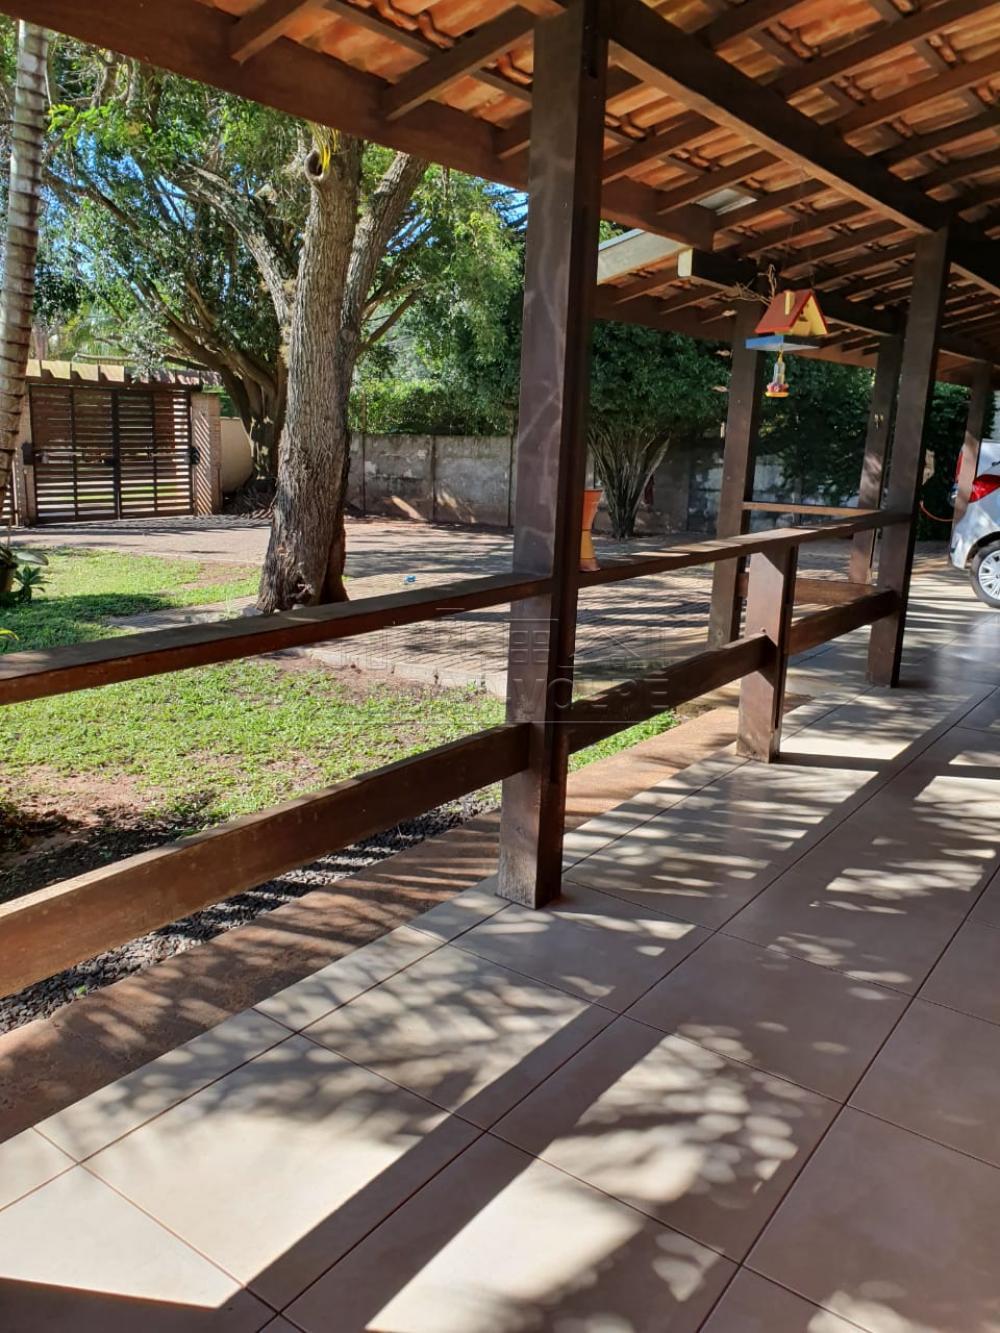 Comprar Casa / Condomínio em Bauru apenas R$ 2.700.000,00 - Foto 23